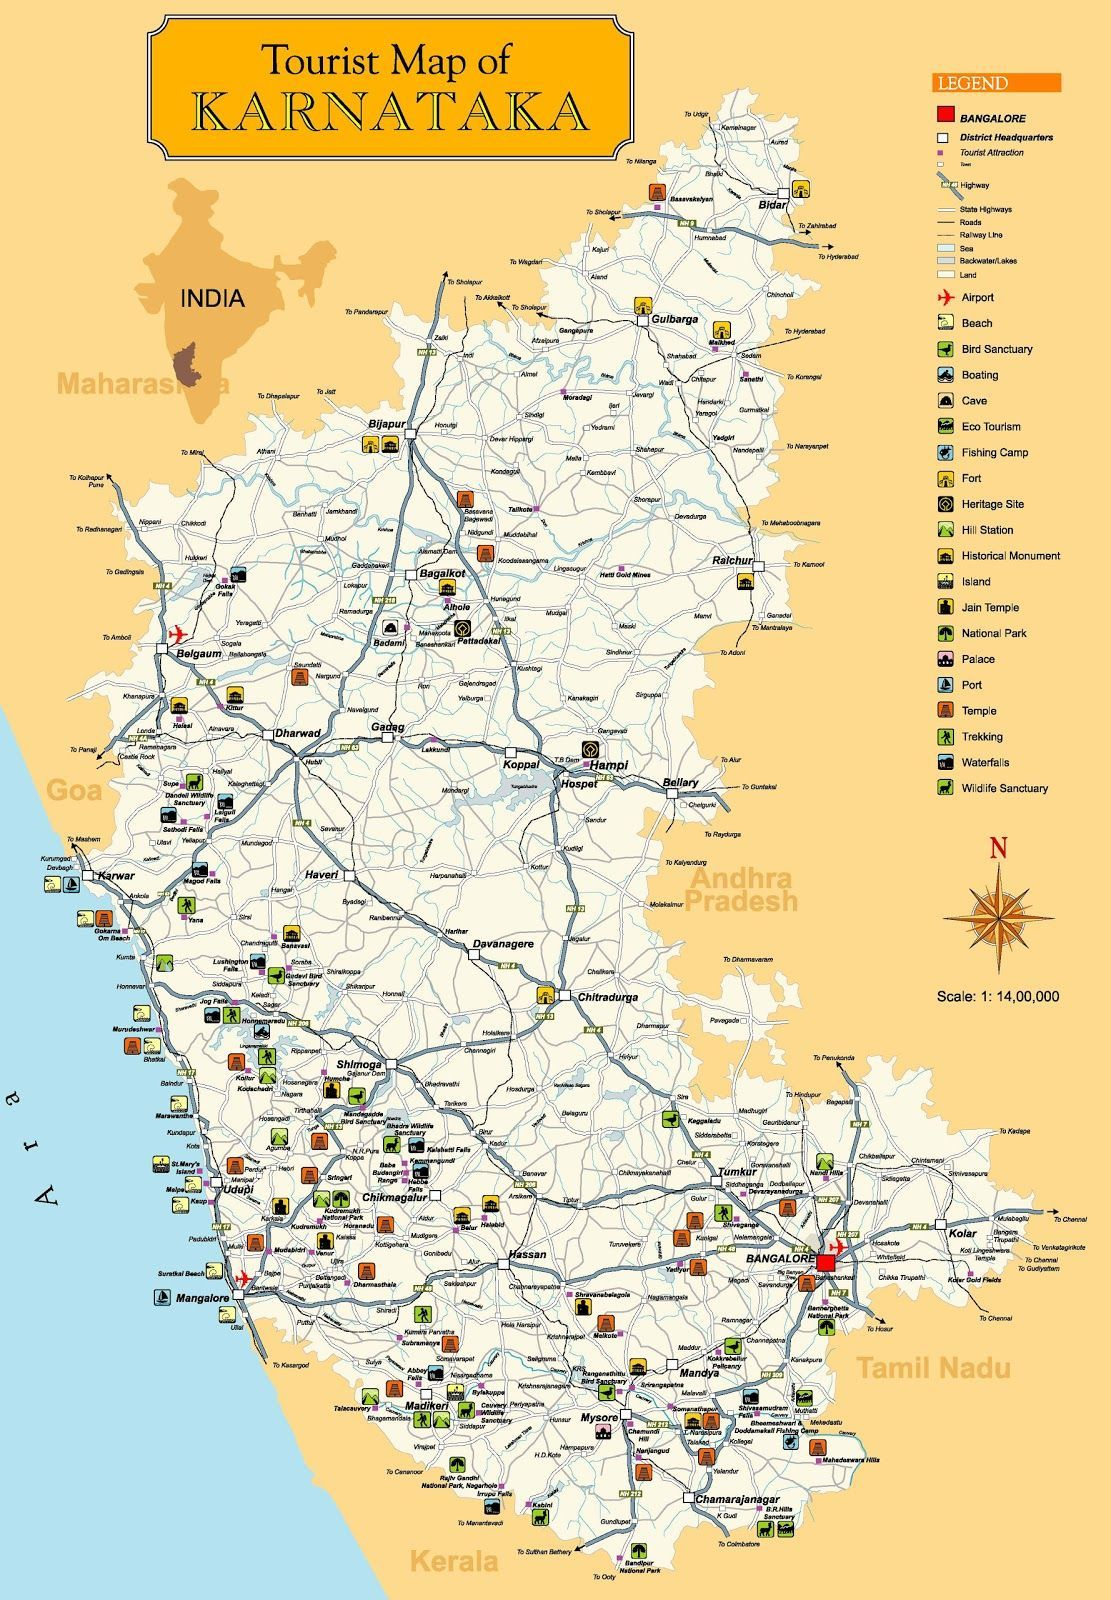 karnataka tourist maps - Google Search in 2020 | Tourist map ... on map of delhi, map of rajasthan, map of haryana, map of bangalore, map of kashmir, map of mysore, map of yunnan province, map of hubei province, map of gujarat, map of andhra pradesh, map of orissa, map of nunatsiavut, map of mumbai, map of uttar pradesh, map of maharashtra, map of arunachal pradesh, map of india, map of west bengal, map of kerala, map of madhya pradesh,